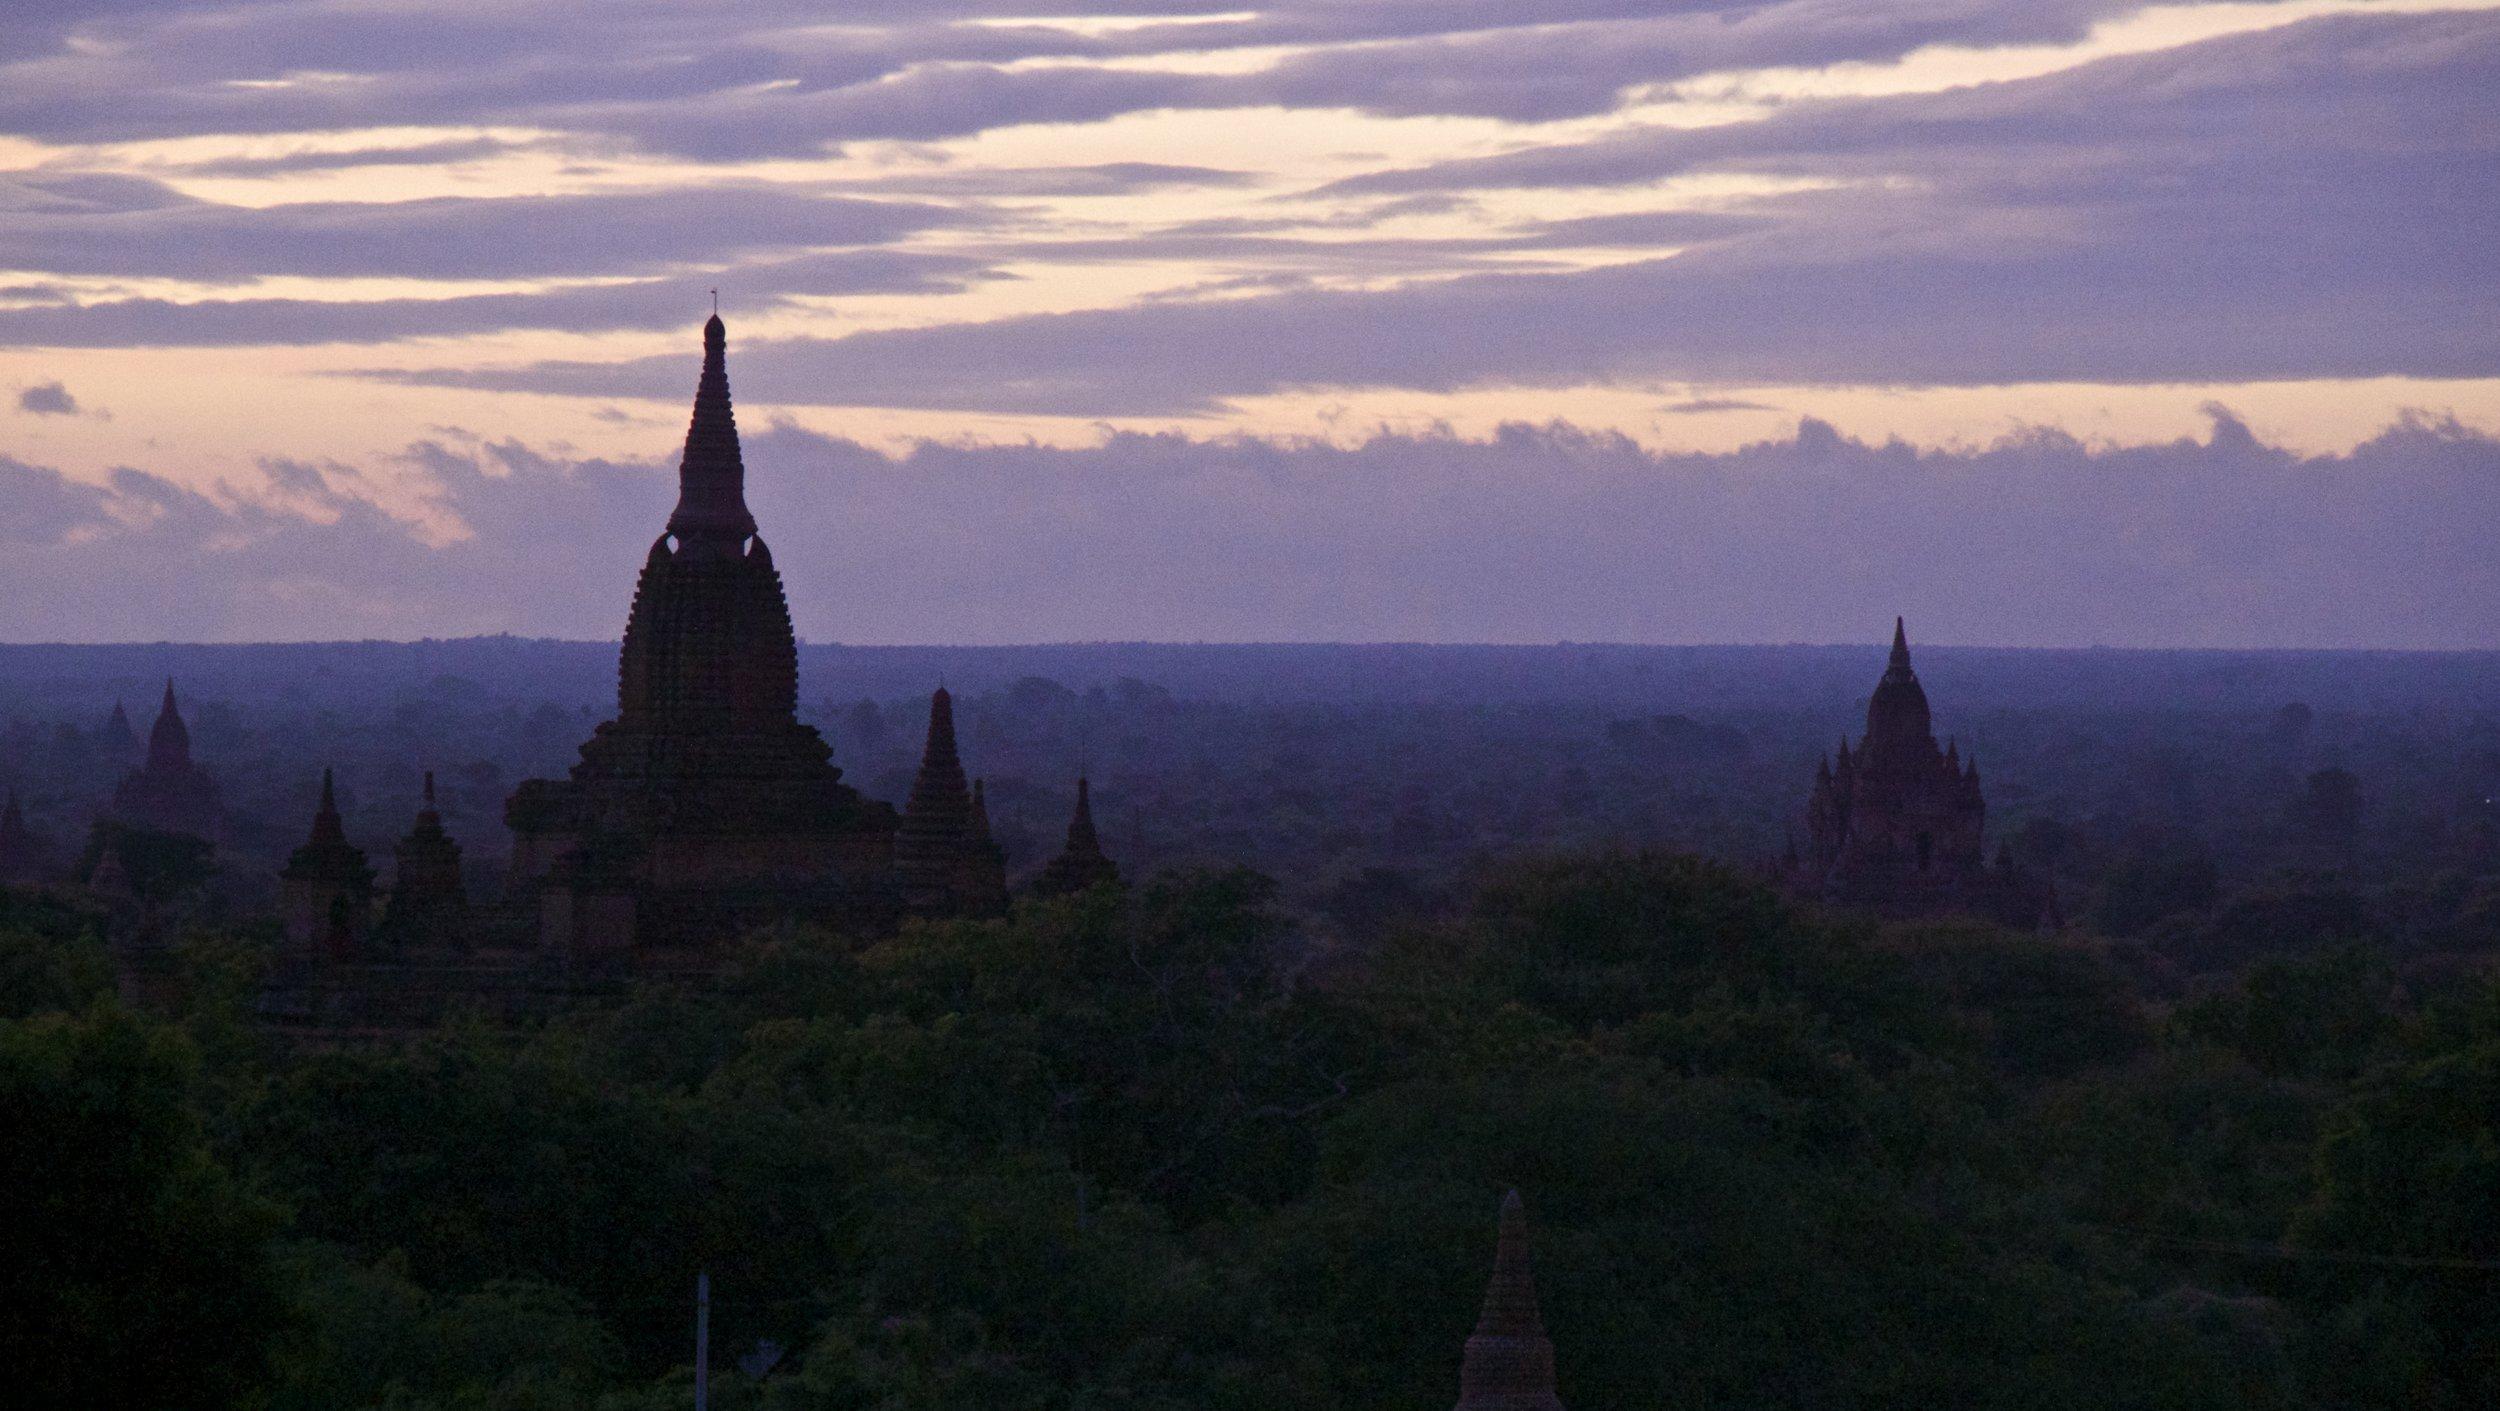 bagan burma myanmar temples sunrise 9.jpg